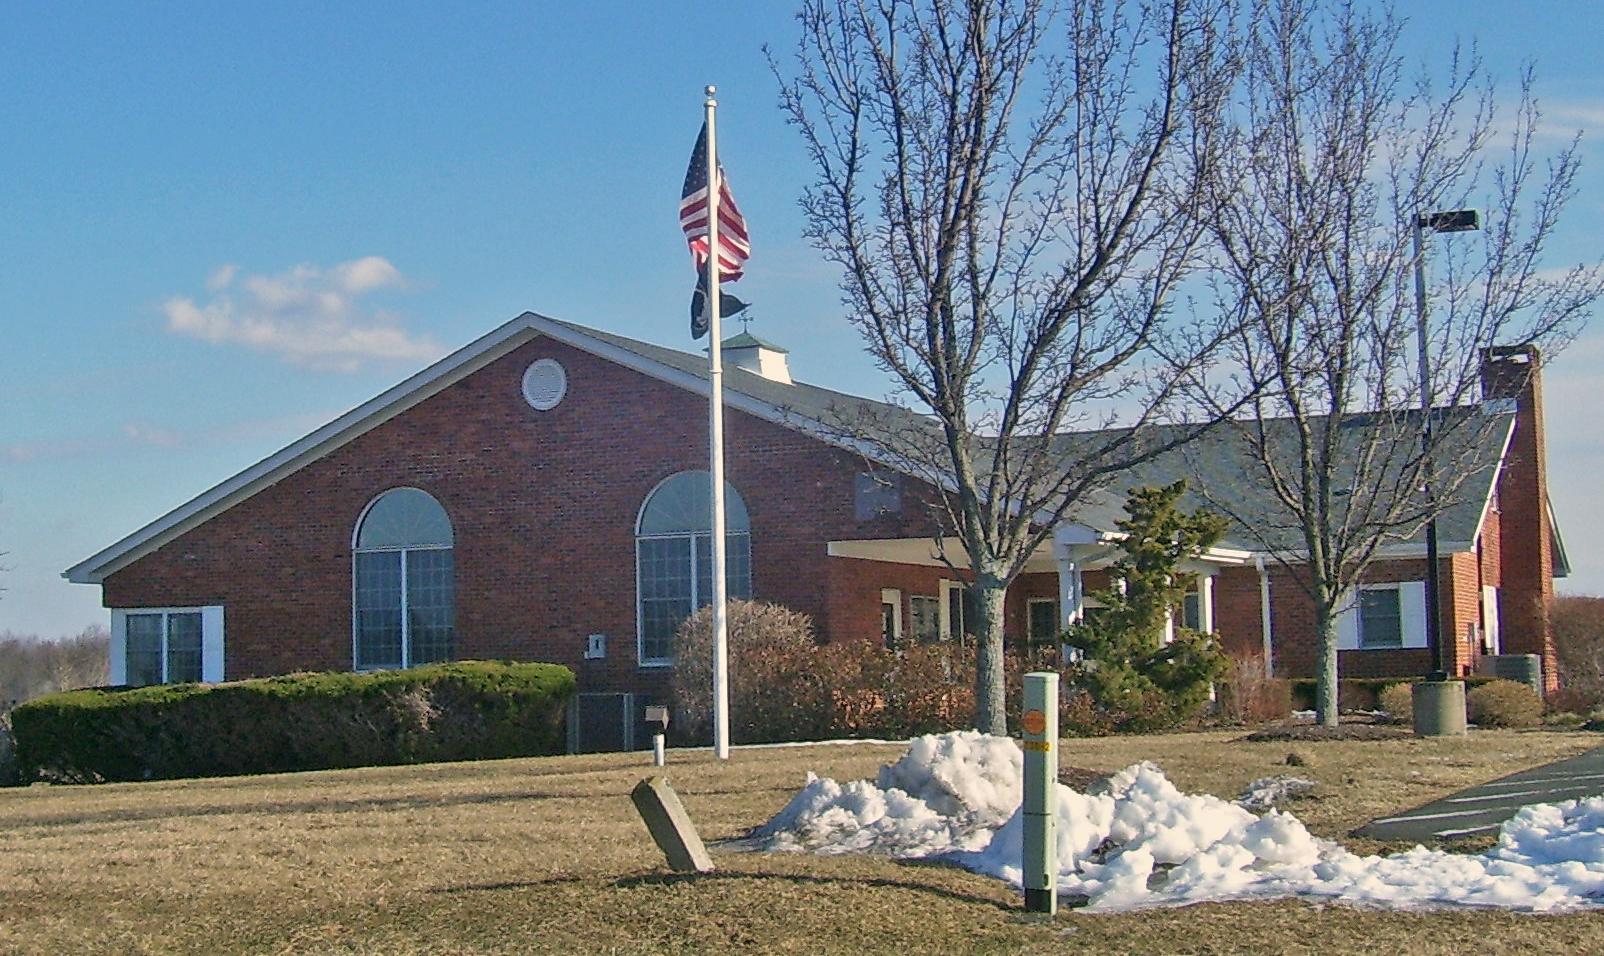 File:Hamptonburgh, NY, Town Hall.jpg - Wikimedia Commonshamptonburgh town